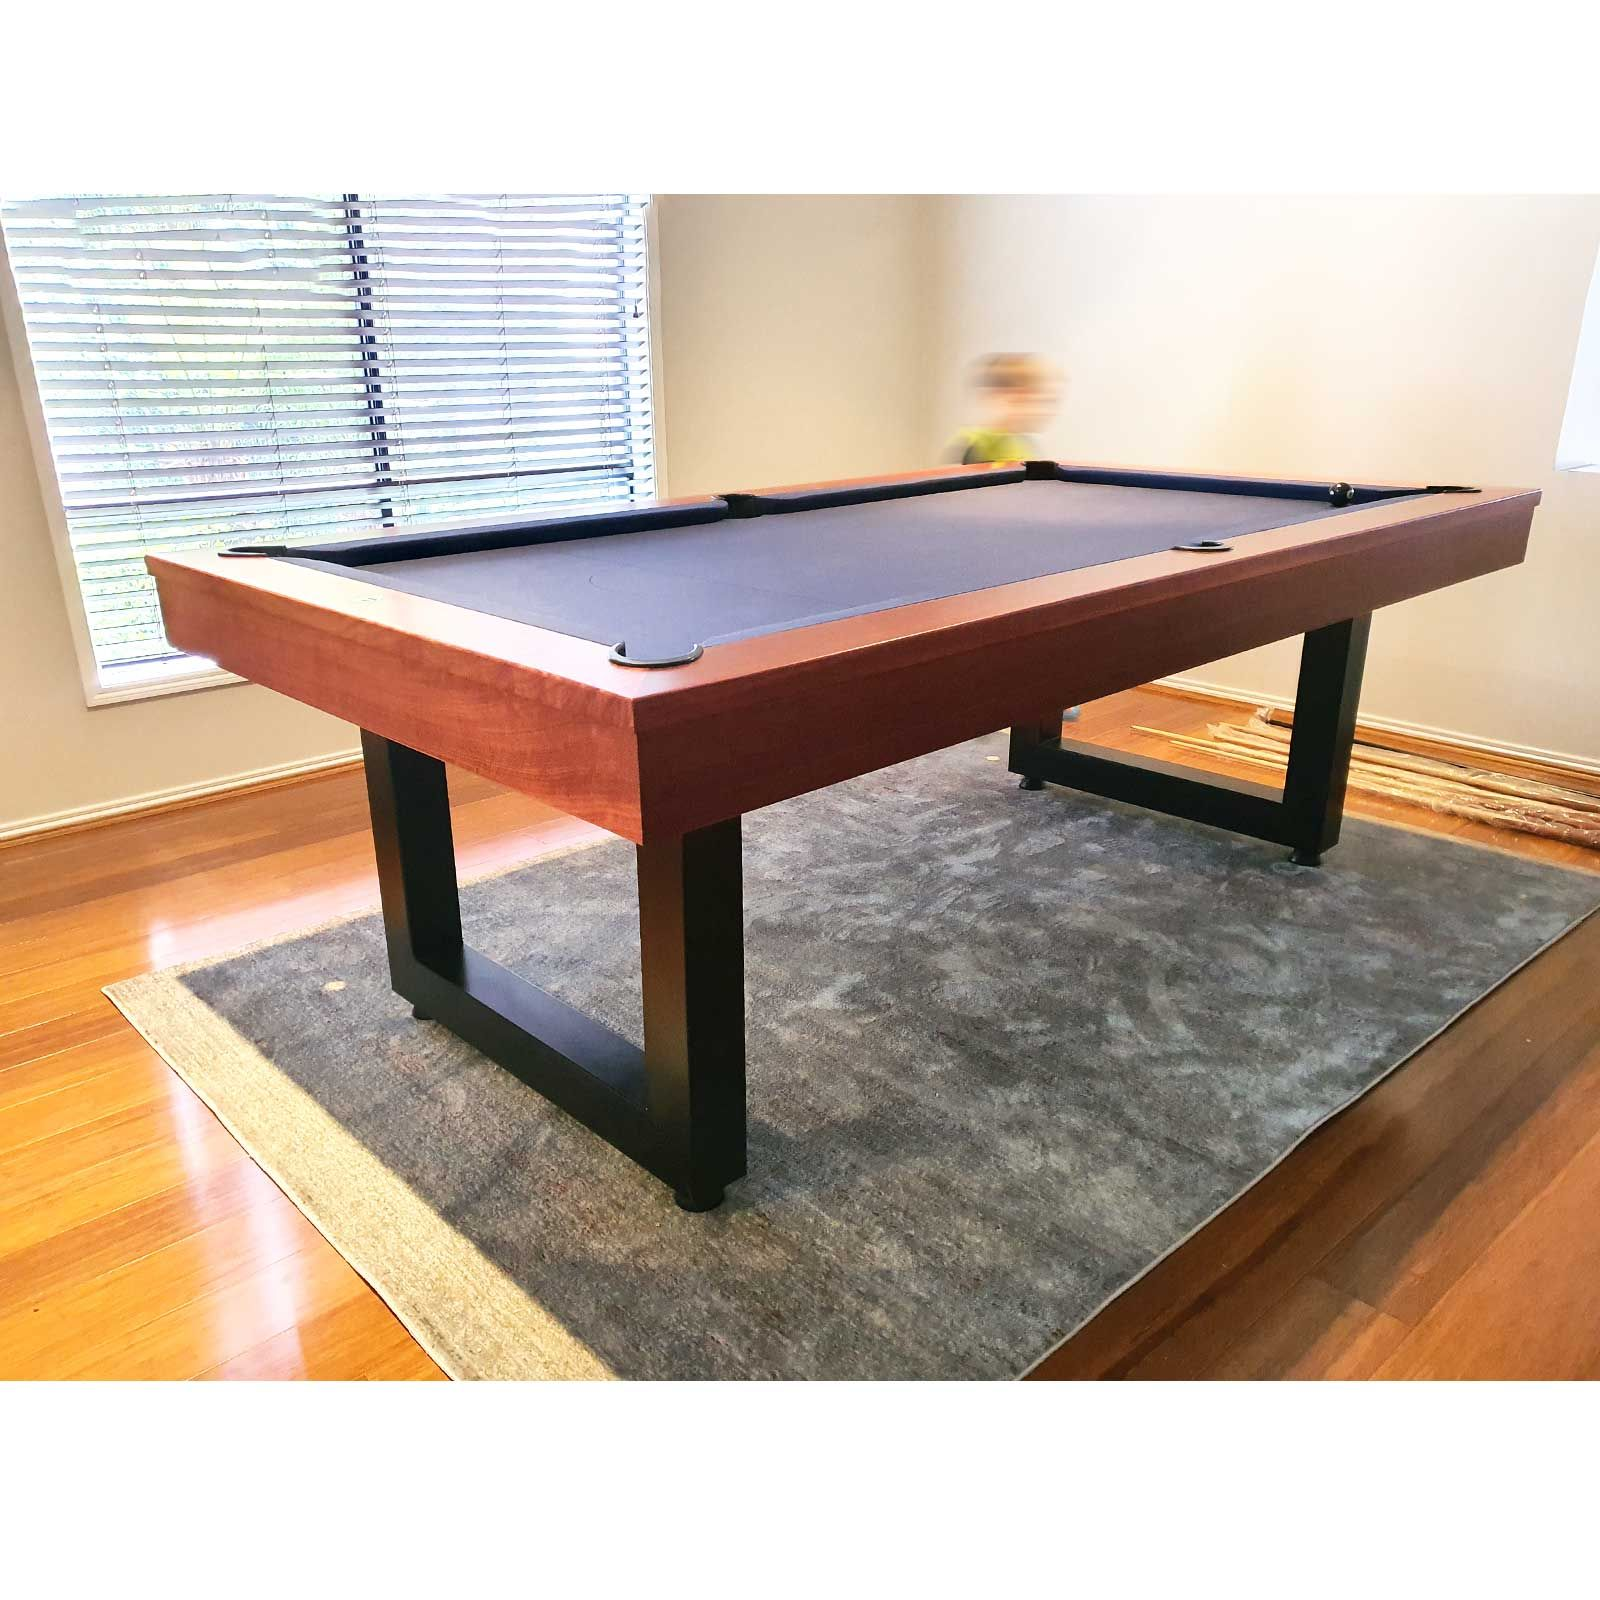 7 foot slate odyssey pool billiards table in 2020